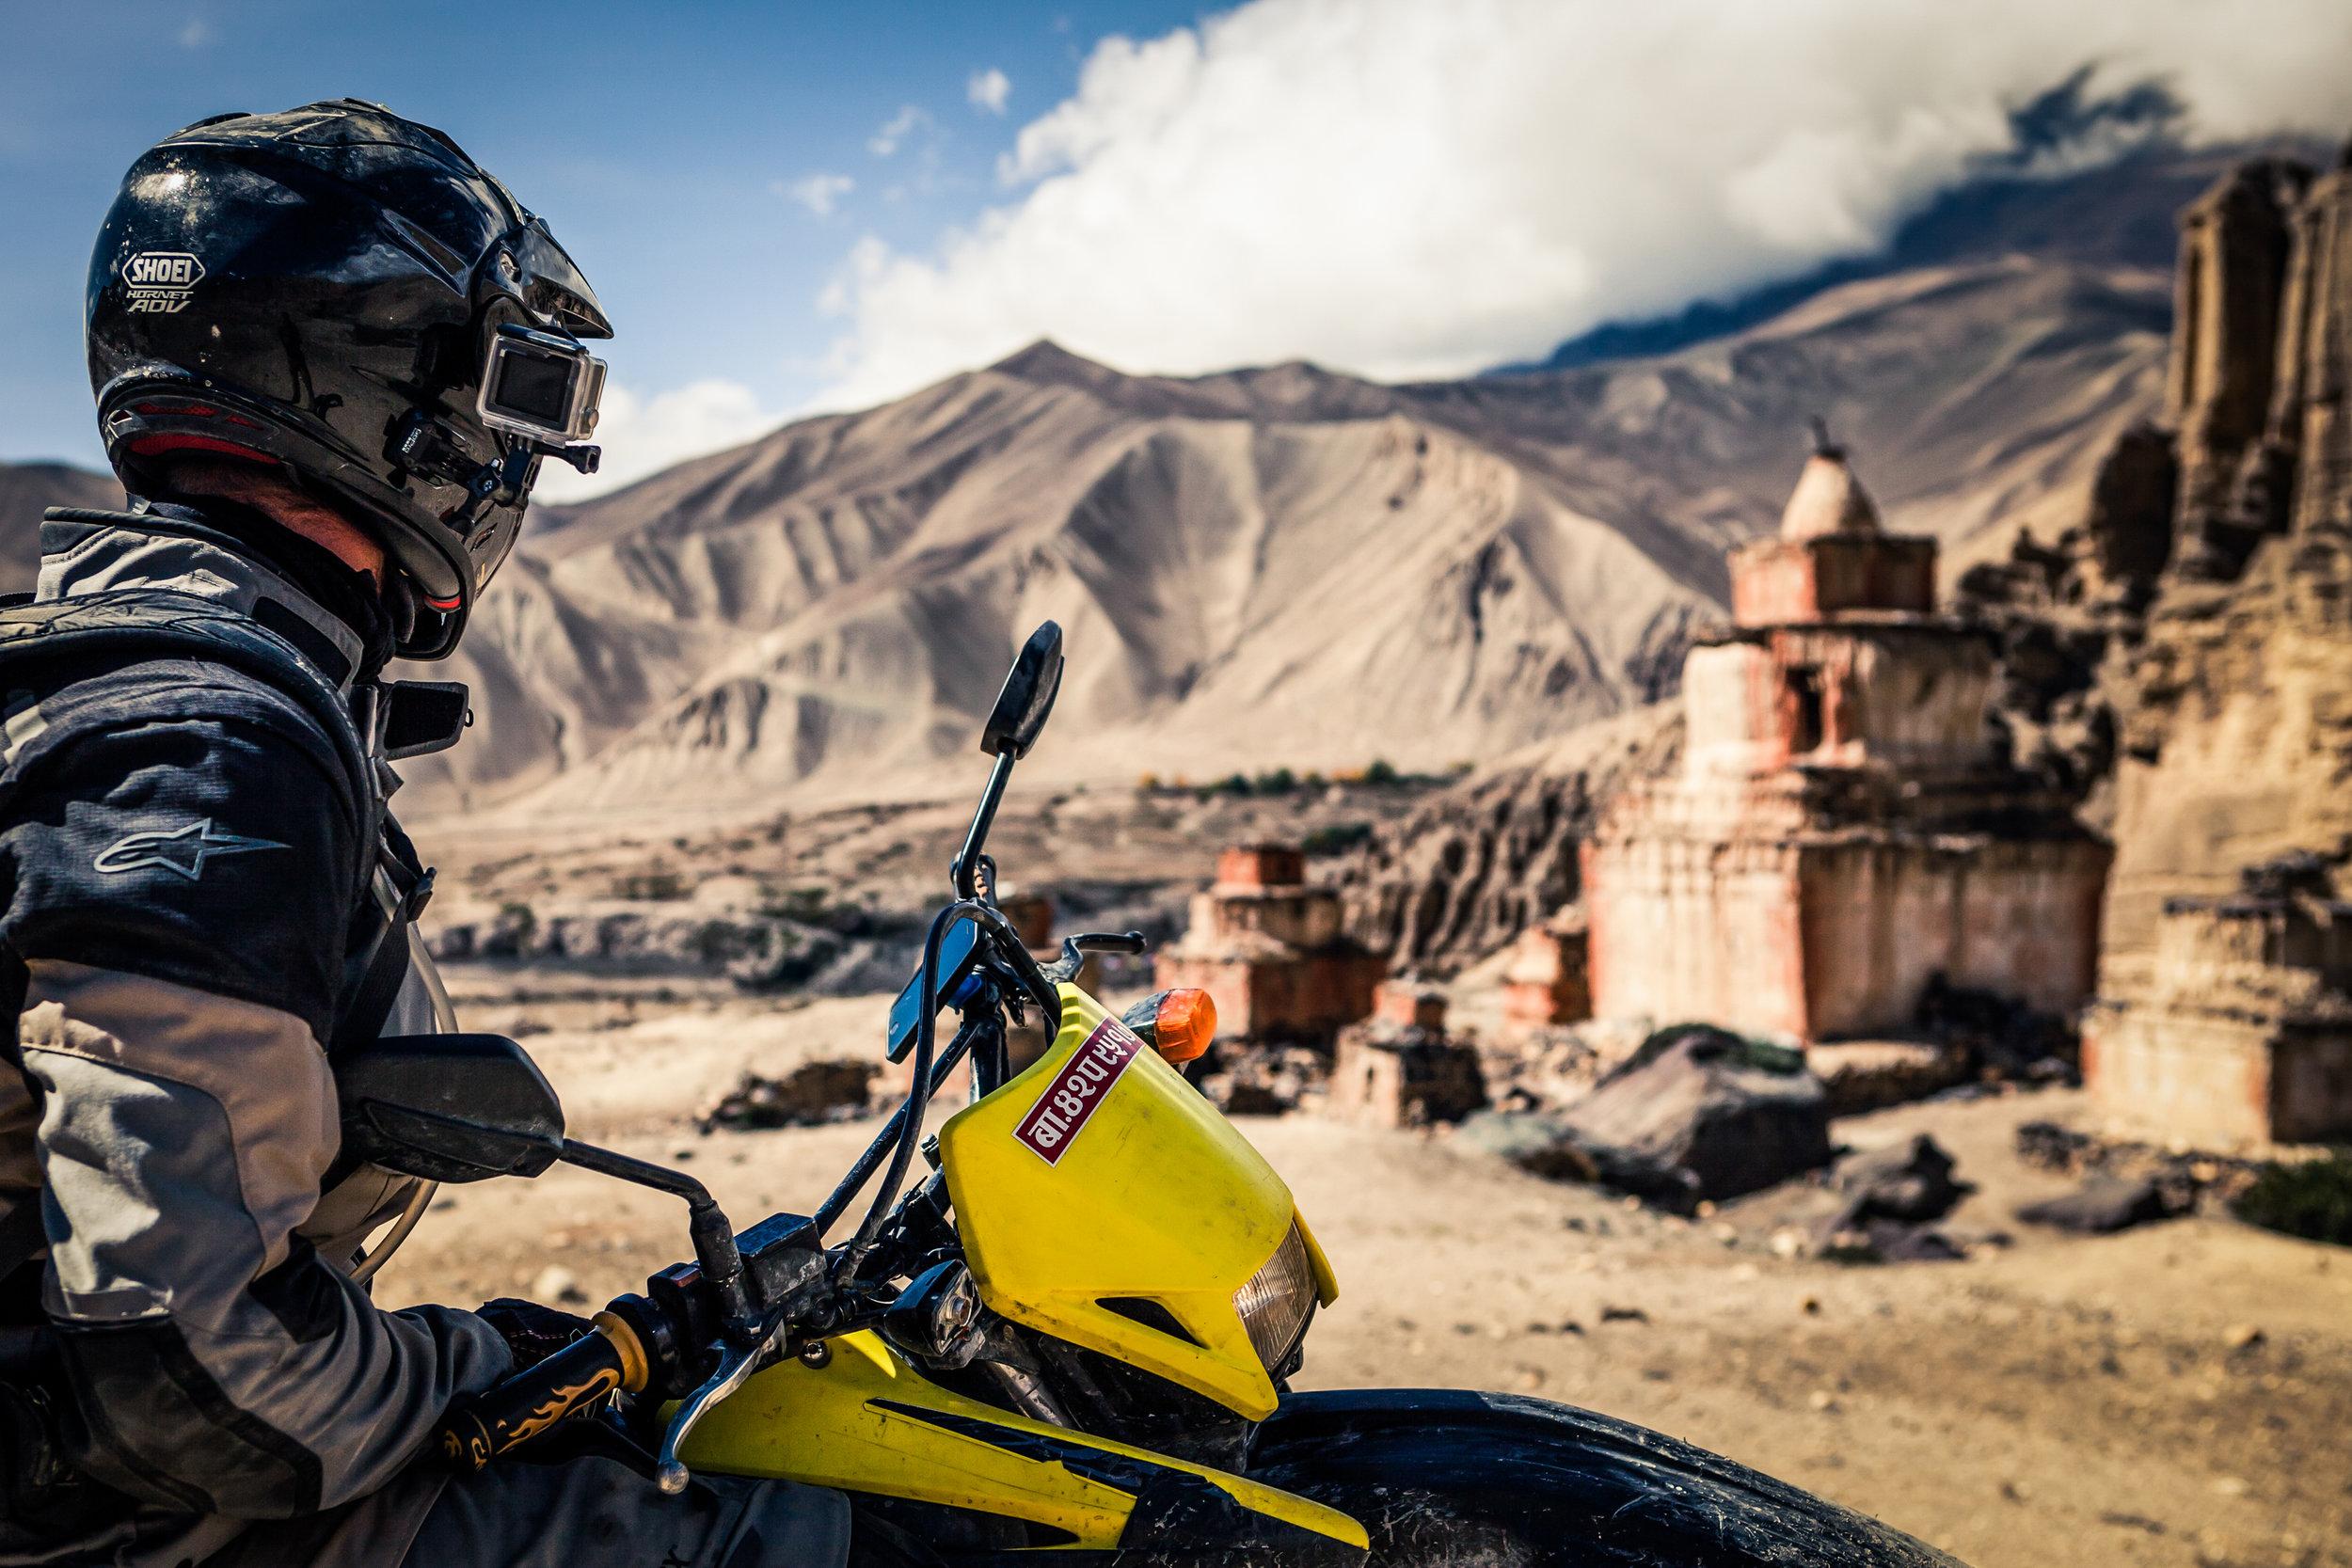 TWHMC-nepal-motorcycle-adventure-2016-1076-2.jpg